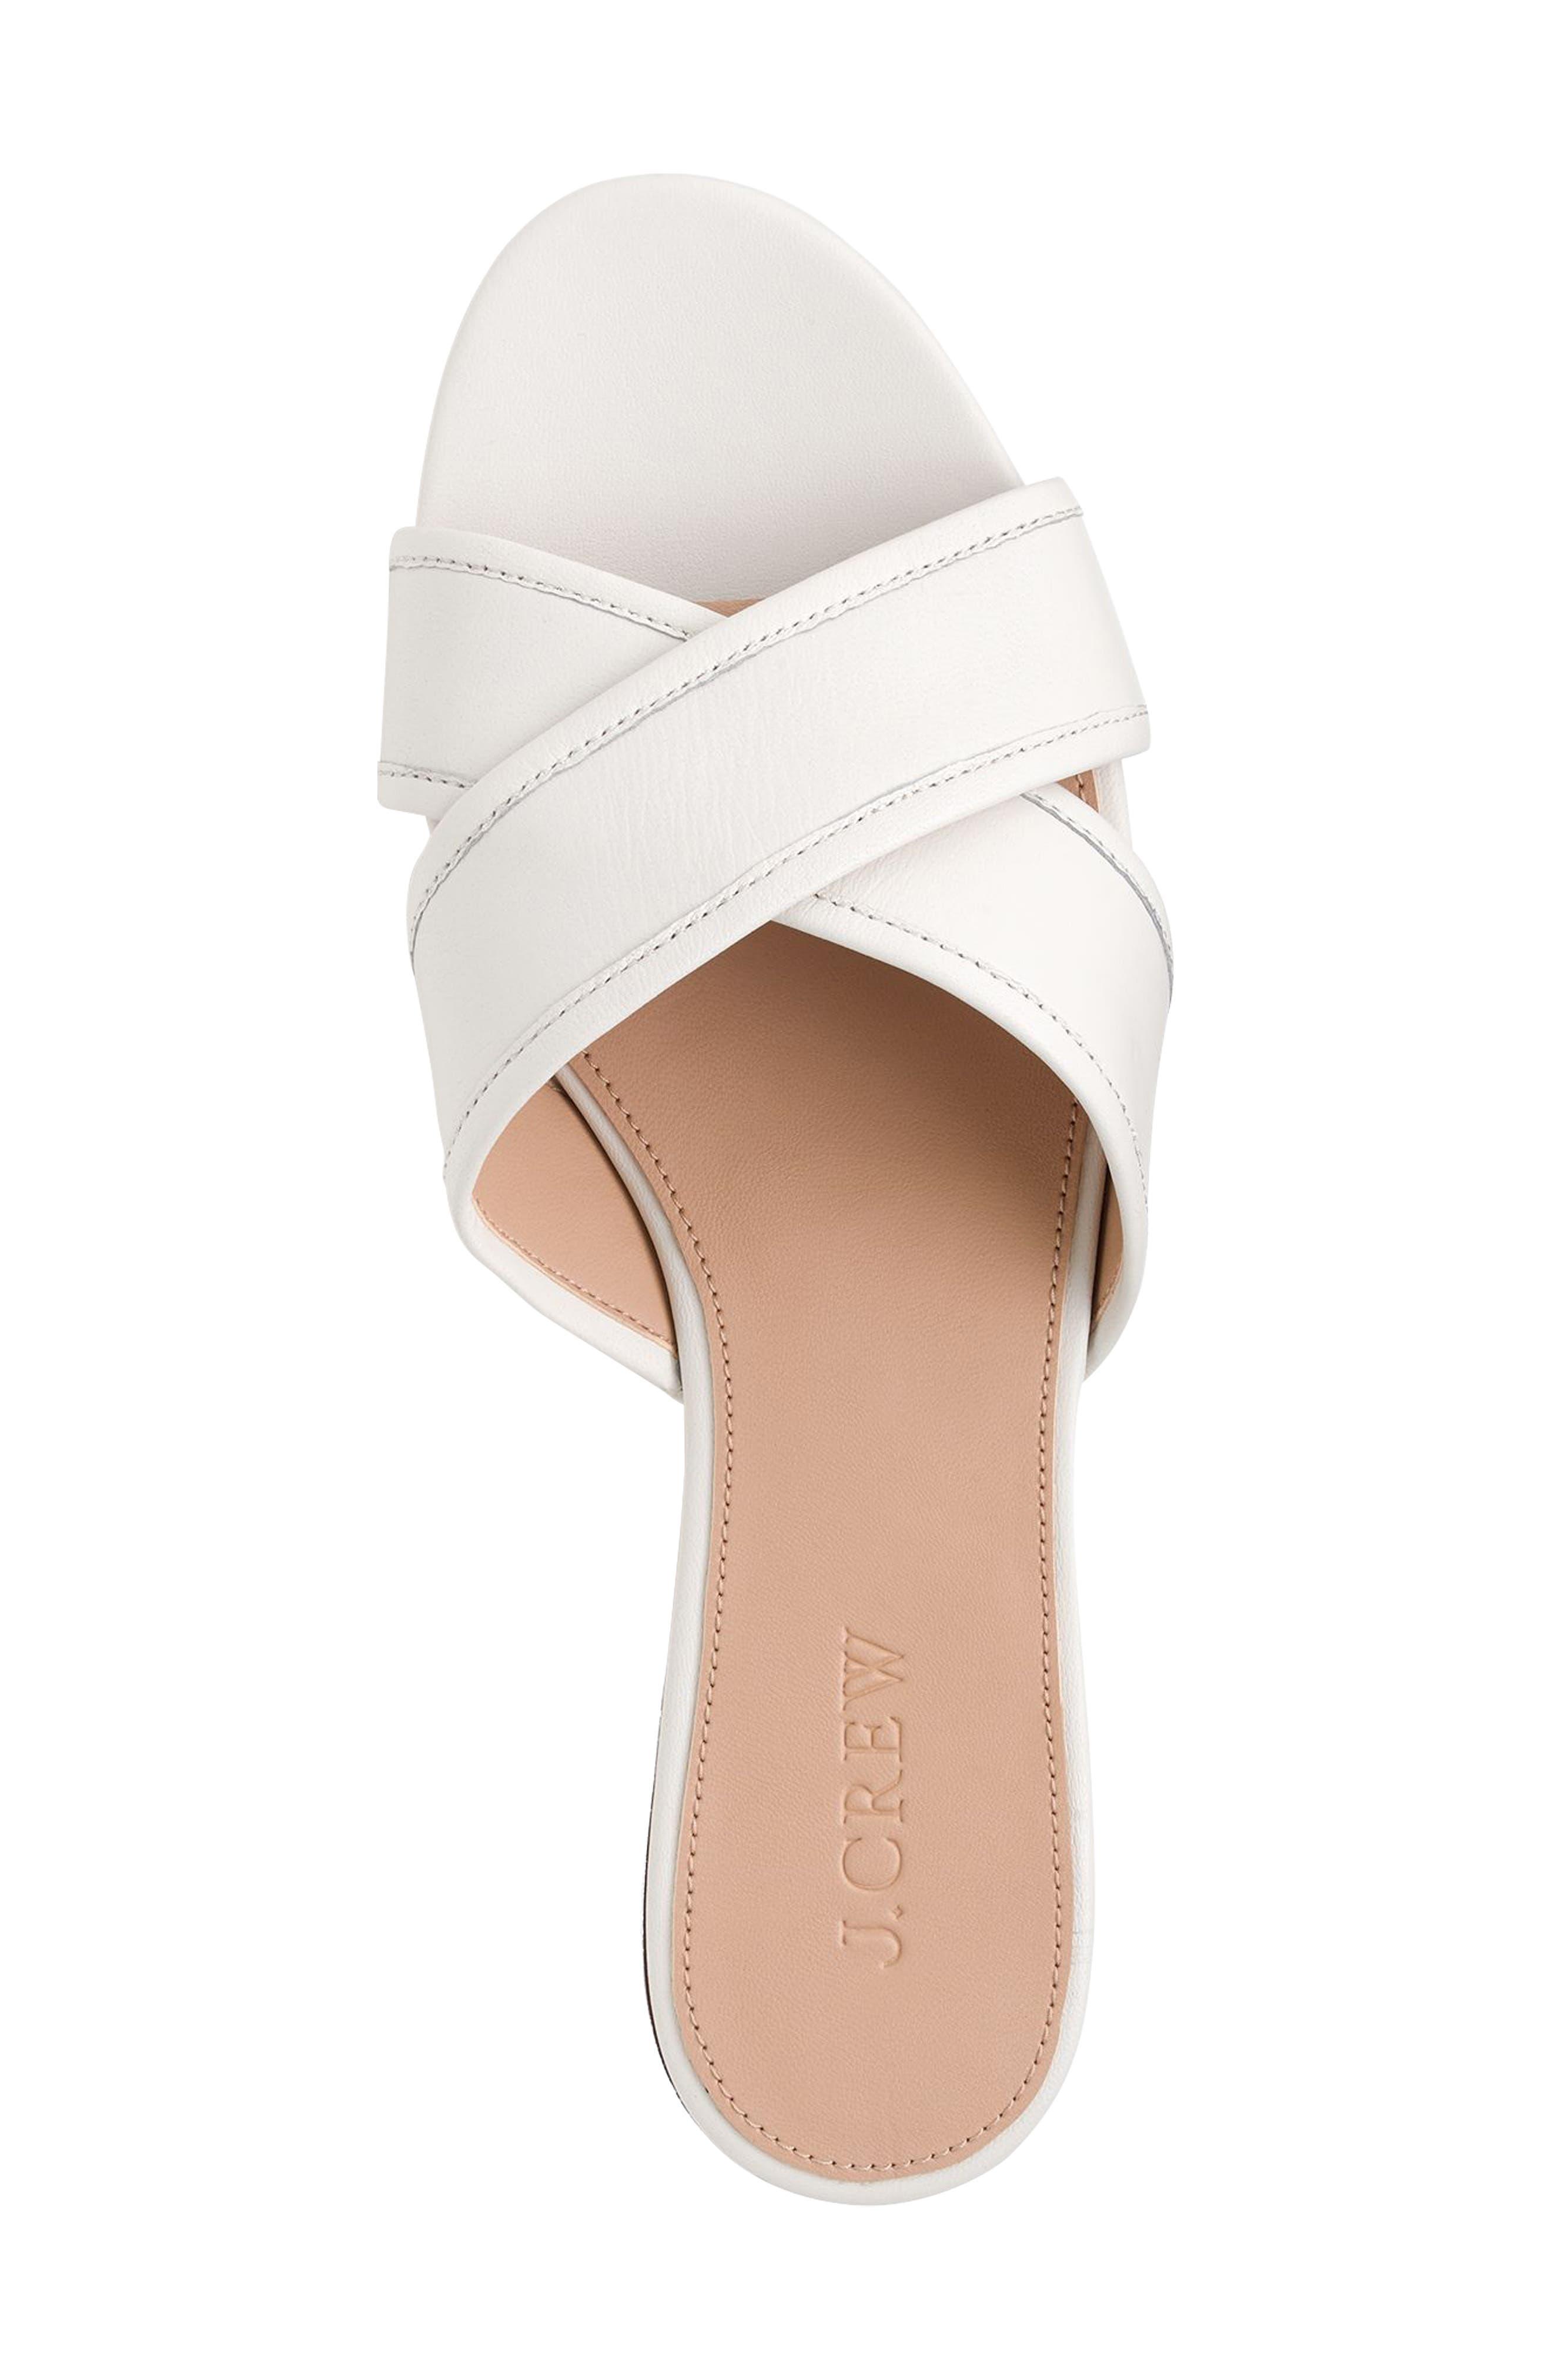 Cora Slide Sandal,                             Alternate thumbnail 3, color,                             Vintage Champagne Leather